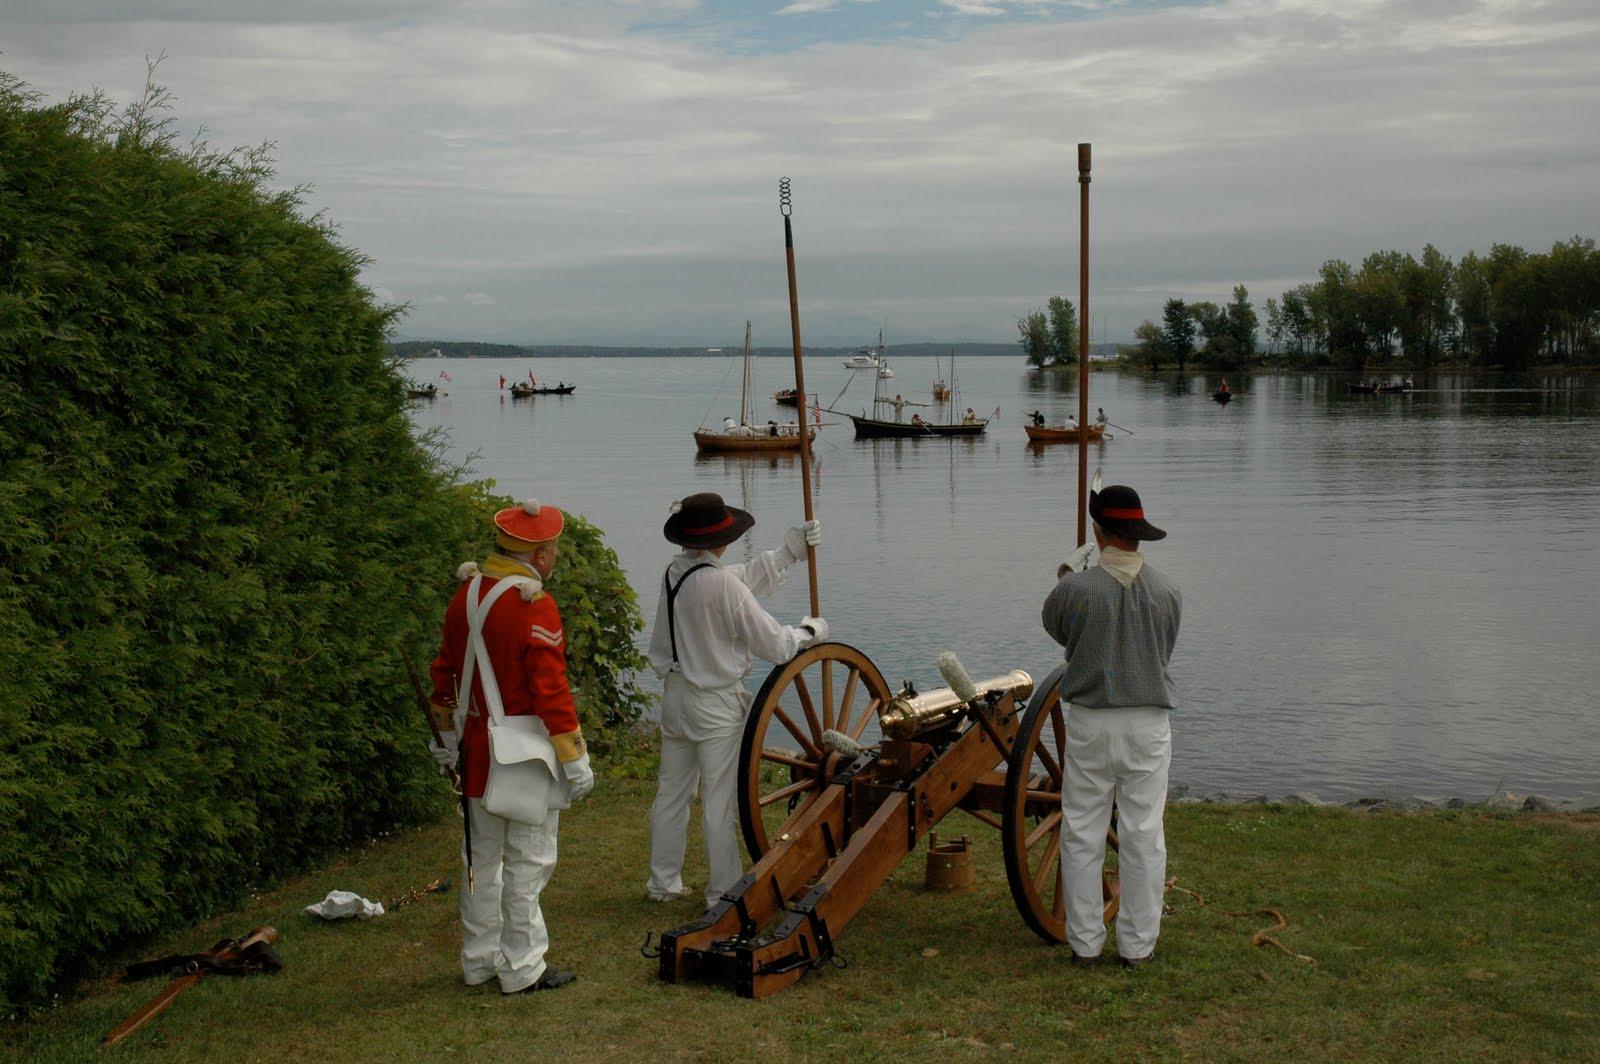 Battle Of Plattsburgh Commemoration 2010 Commemoration Of